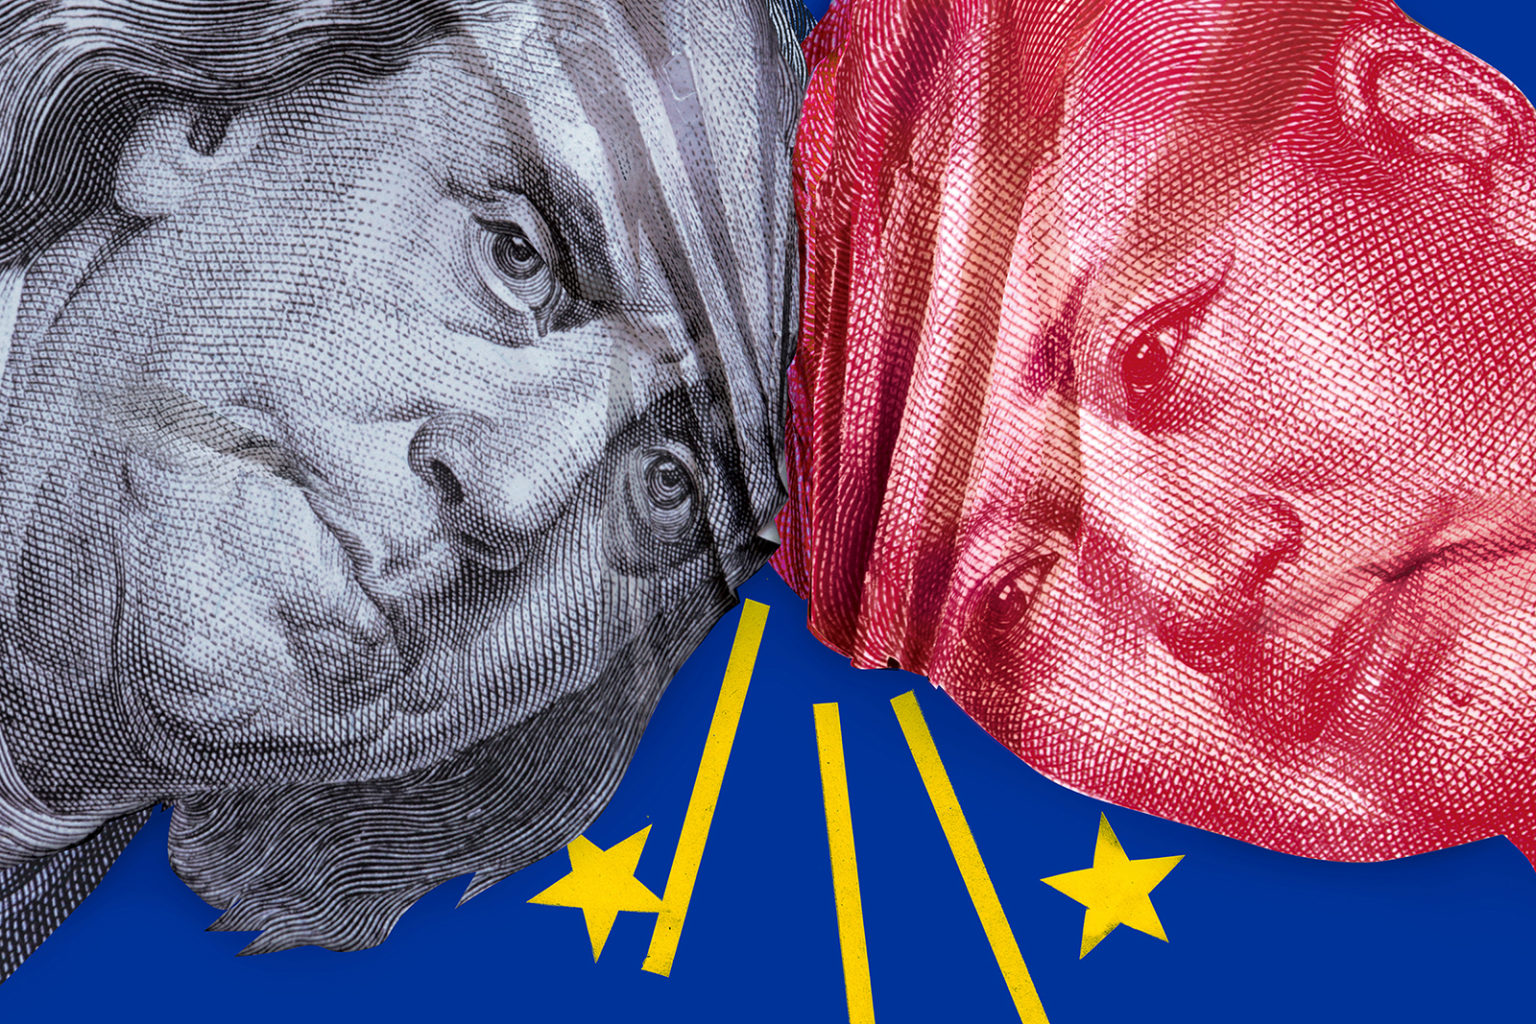 Missing: Has anyone seen Europe's China plan?